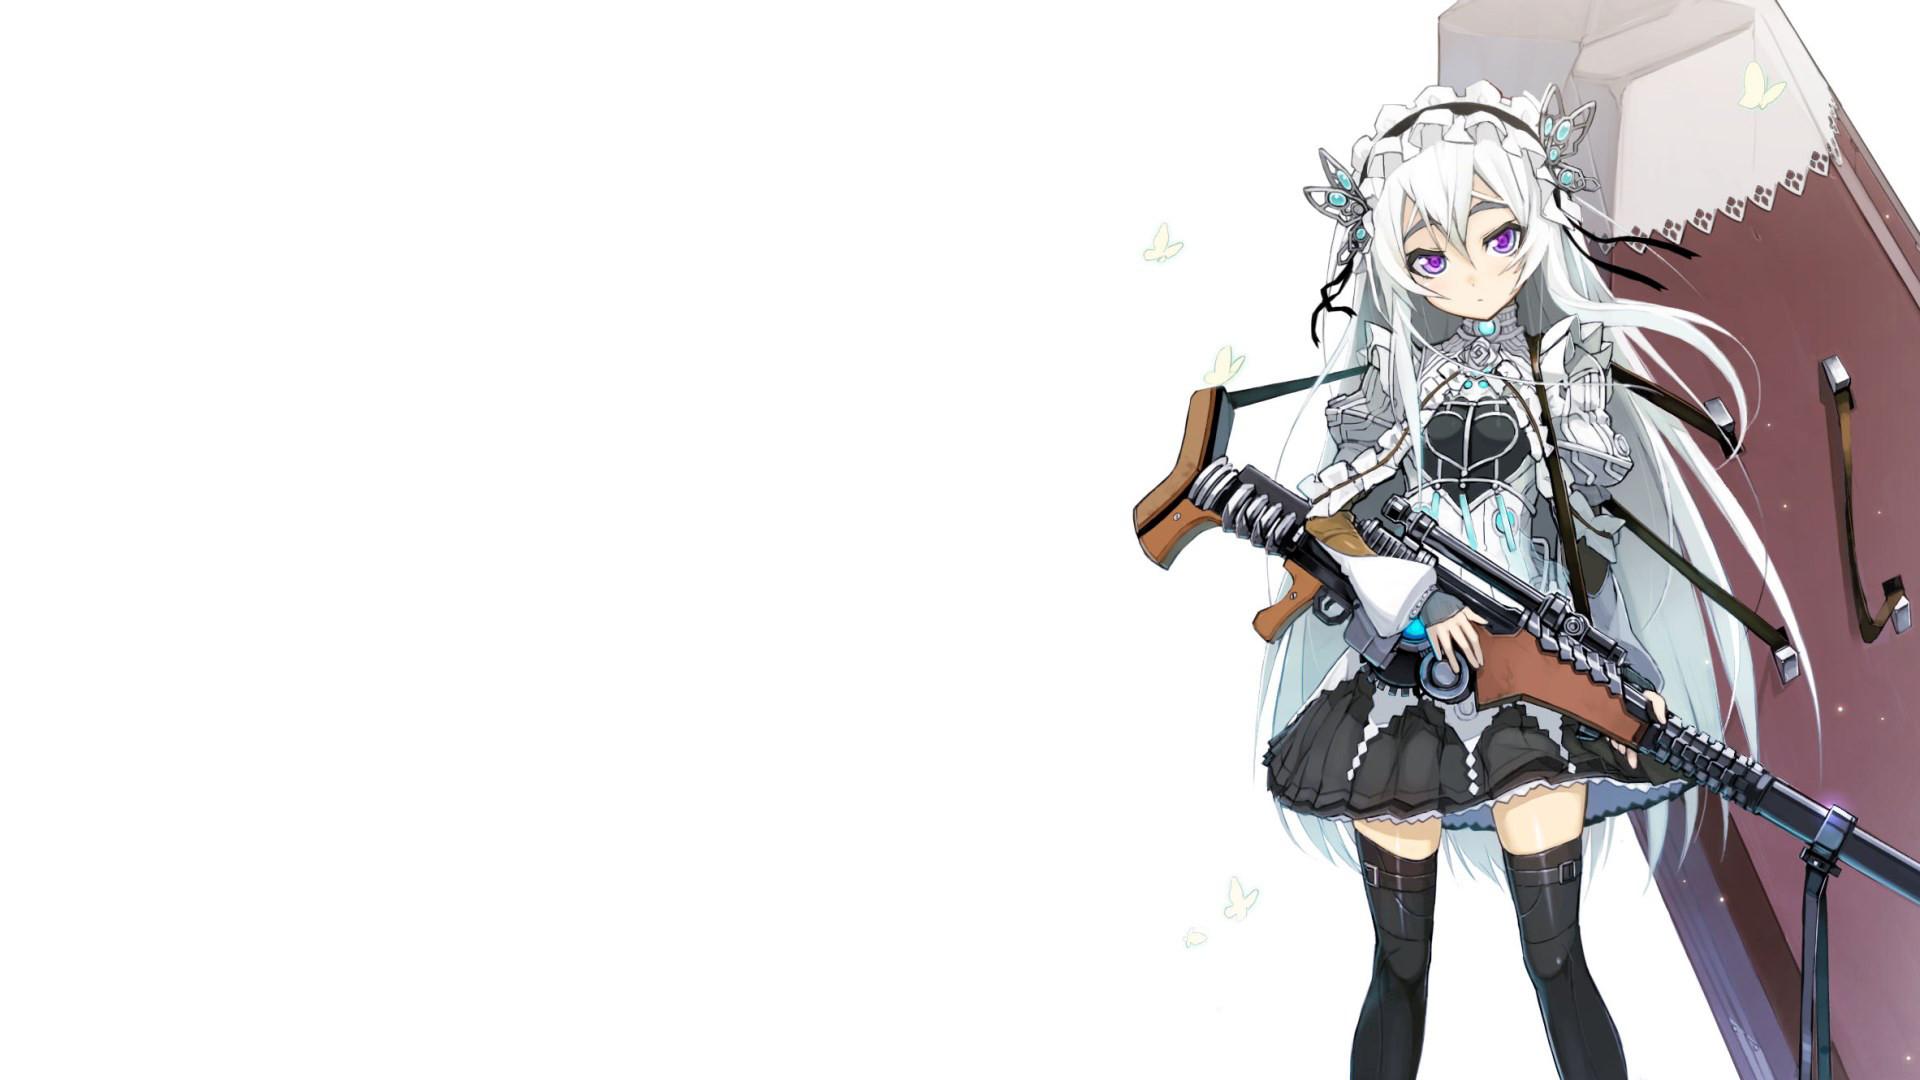 Anime HD Desktop Backgrounds,Cool Anime HD Wallpapers,Anime Wallpaper  1920×1080,Anime Wallpapers for Desktop,1080p Anime Wallpapers,Anime  Wallpaper HD,Anime …